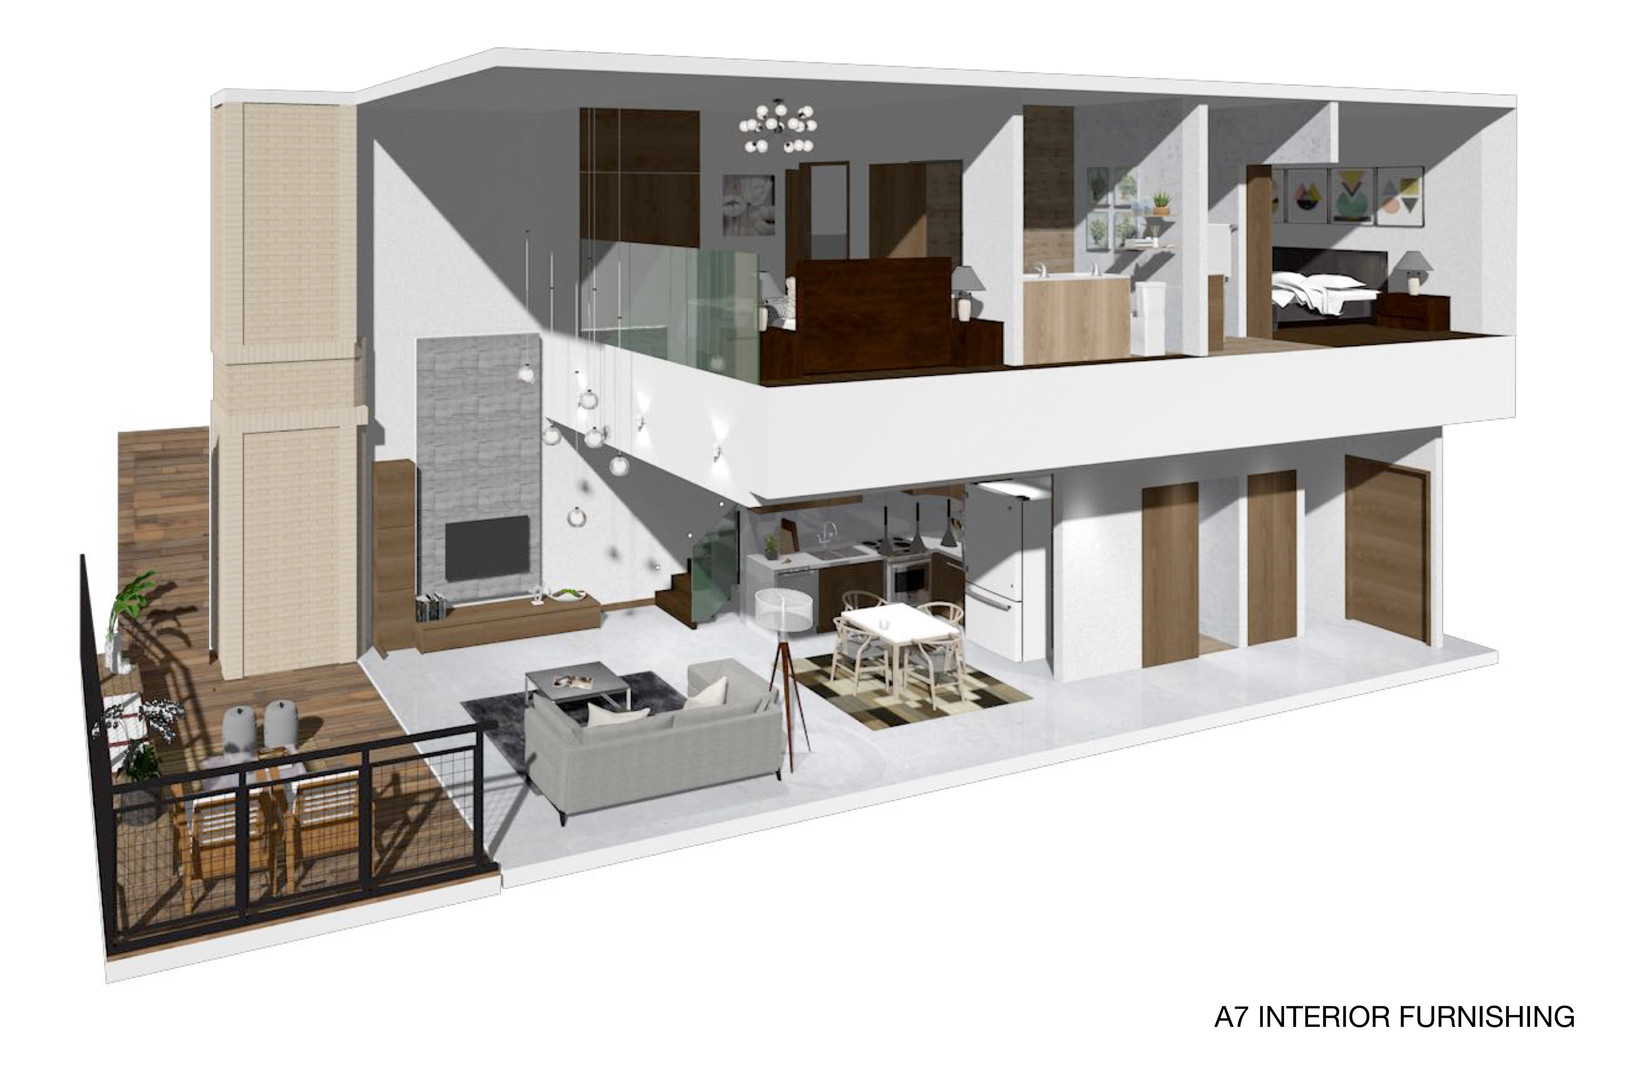 interior rendering 3.jpg